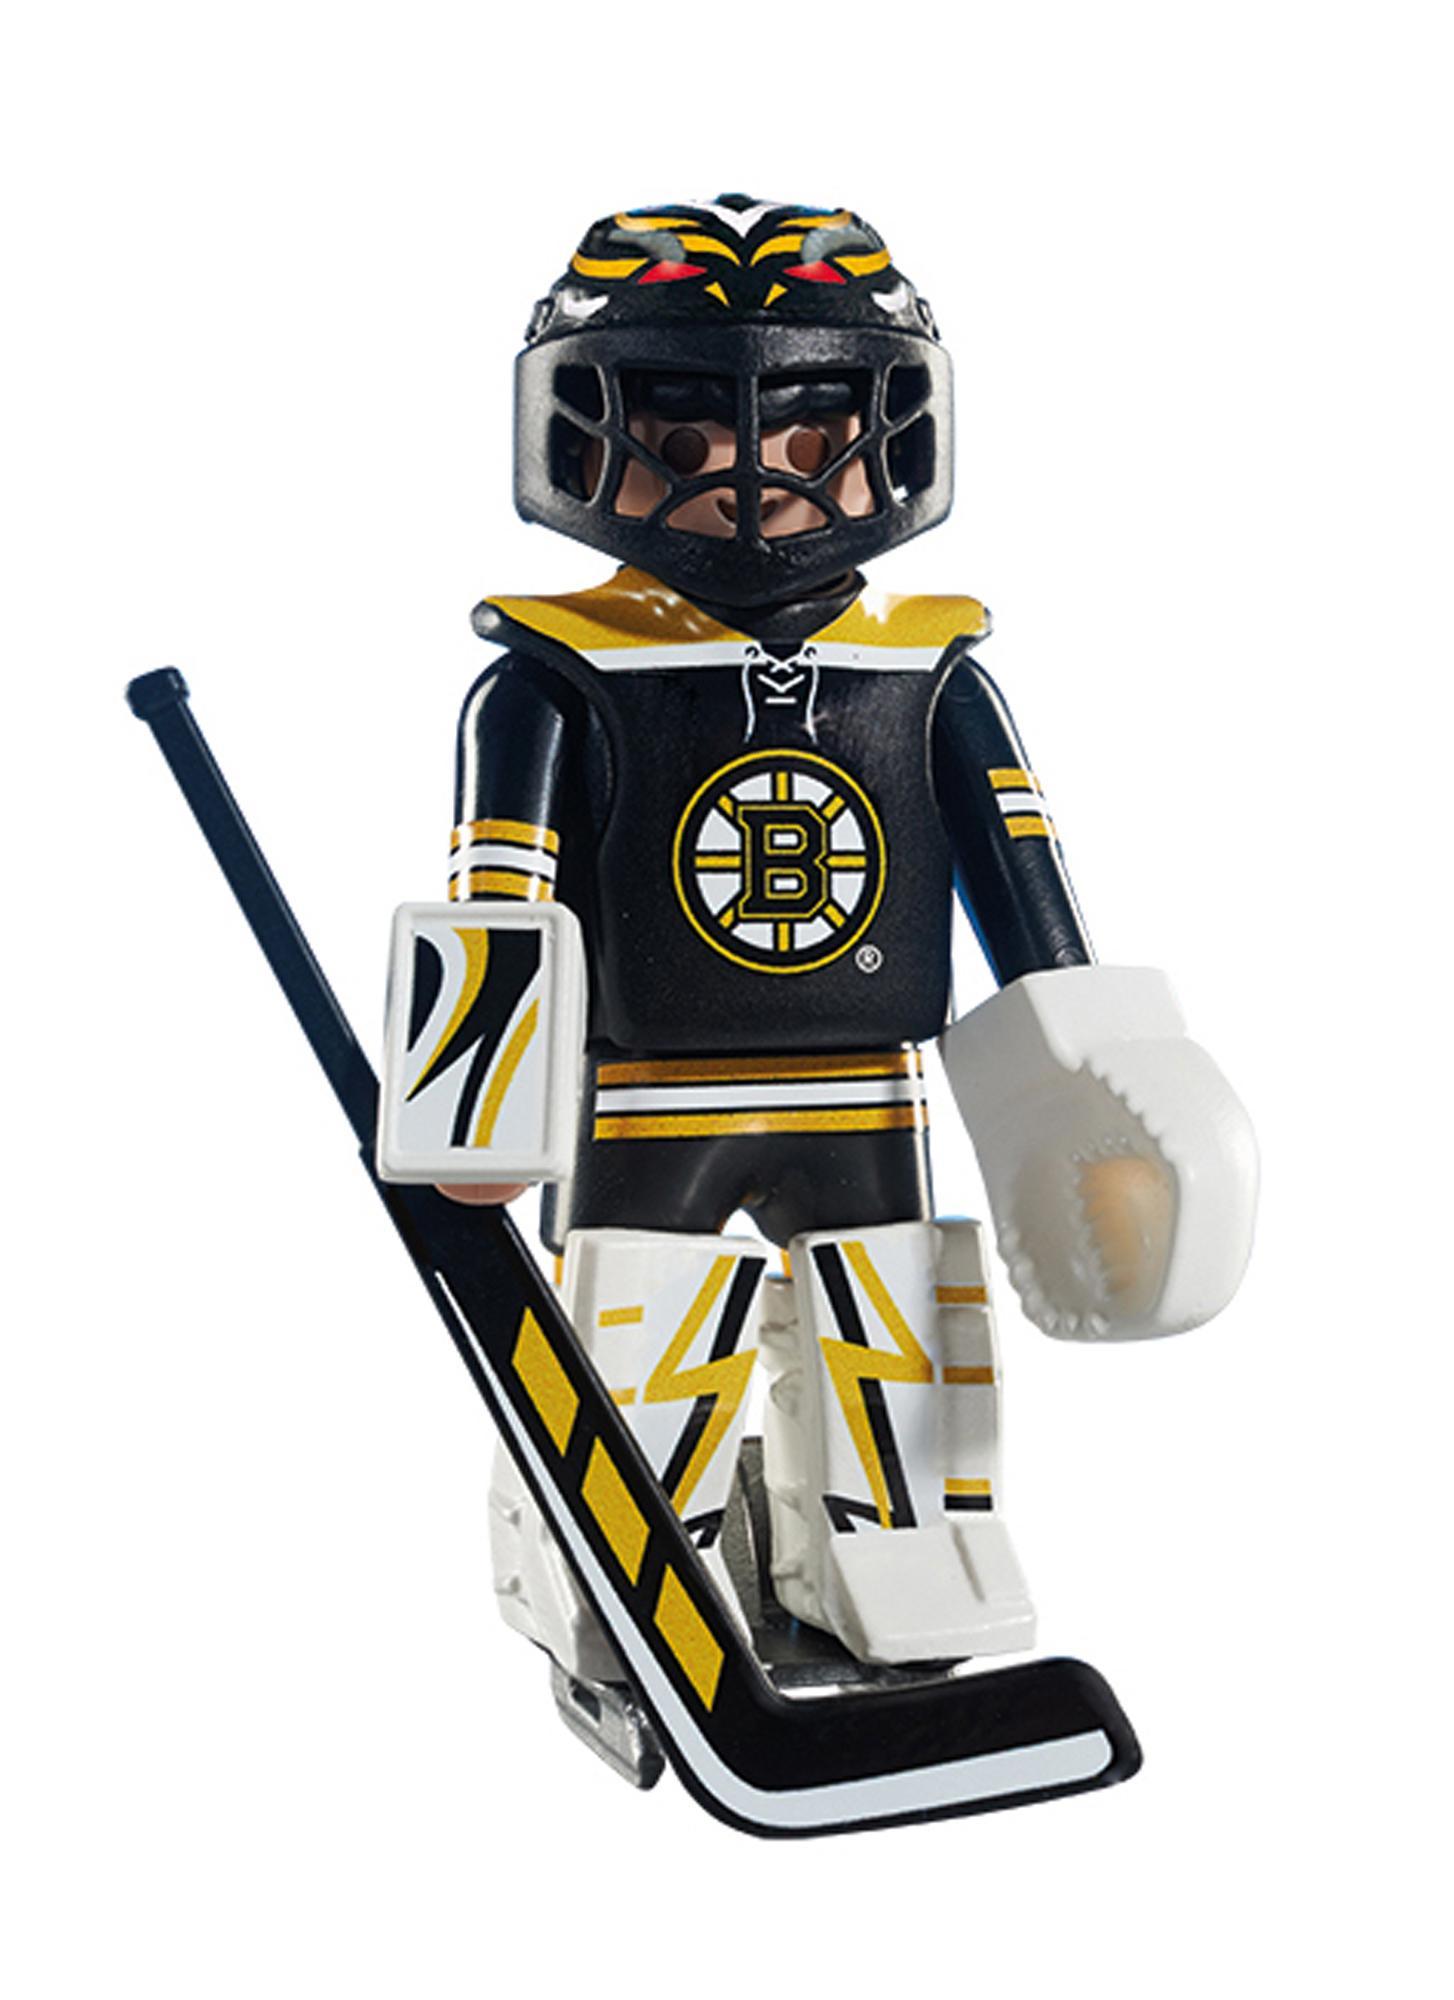 a9dc383b7fc Amazon.com  PLAYMOBIL NHL Boston Bruins Goalie  Toys   Games